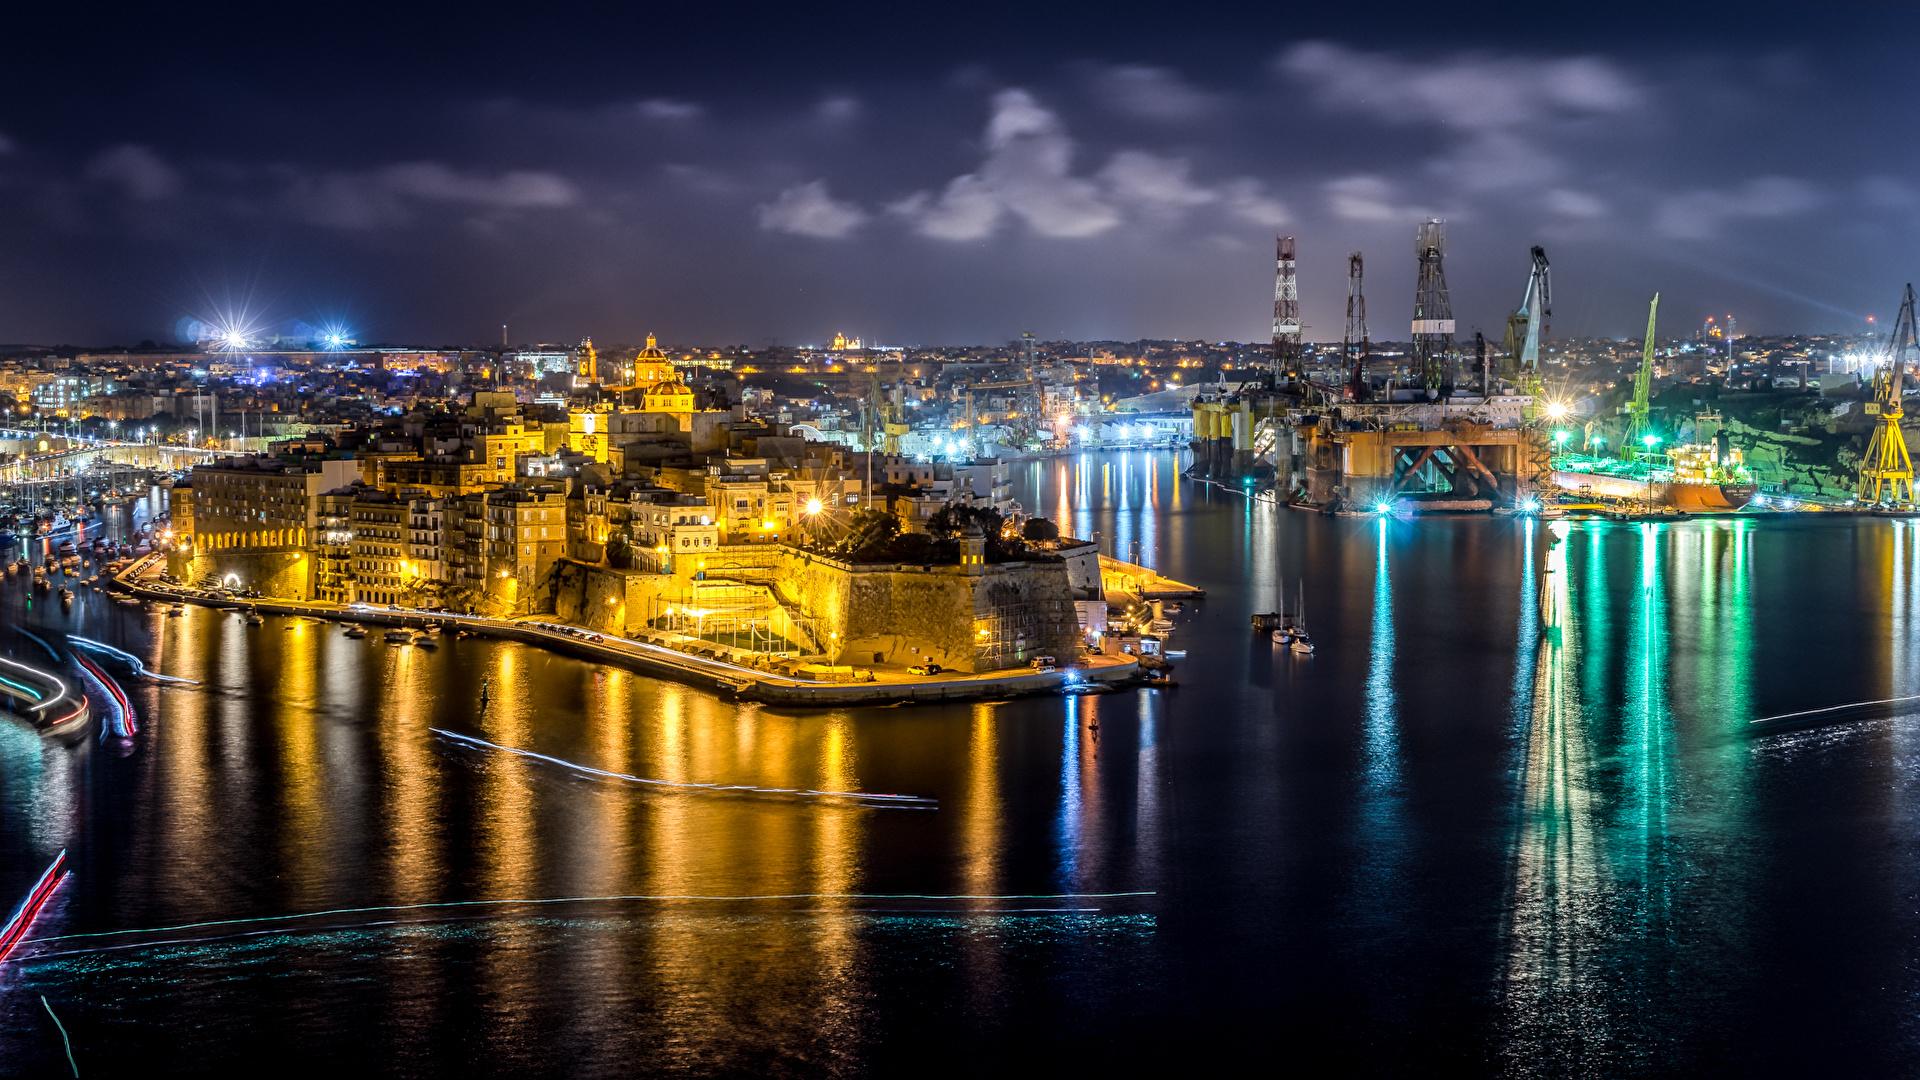 Photos Malta Cospicua Pier Night Rivers Street Lights 1920x1080 Images, Photos, Reviews